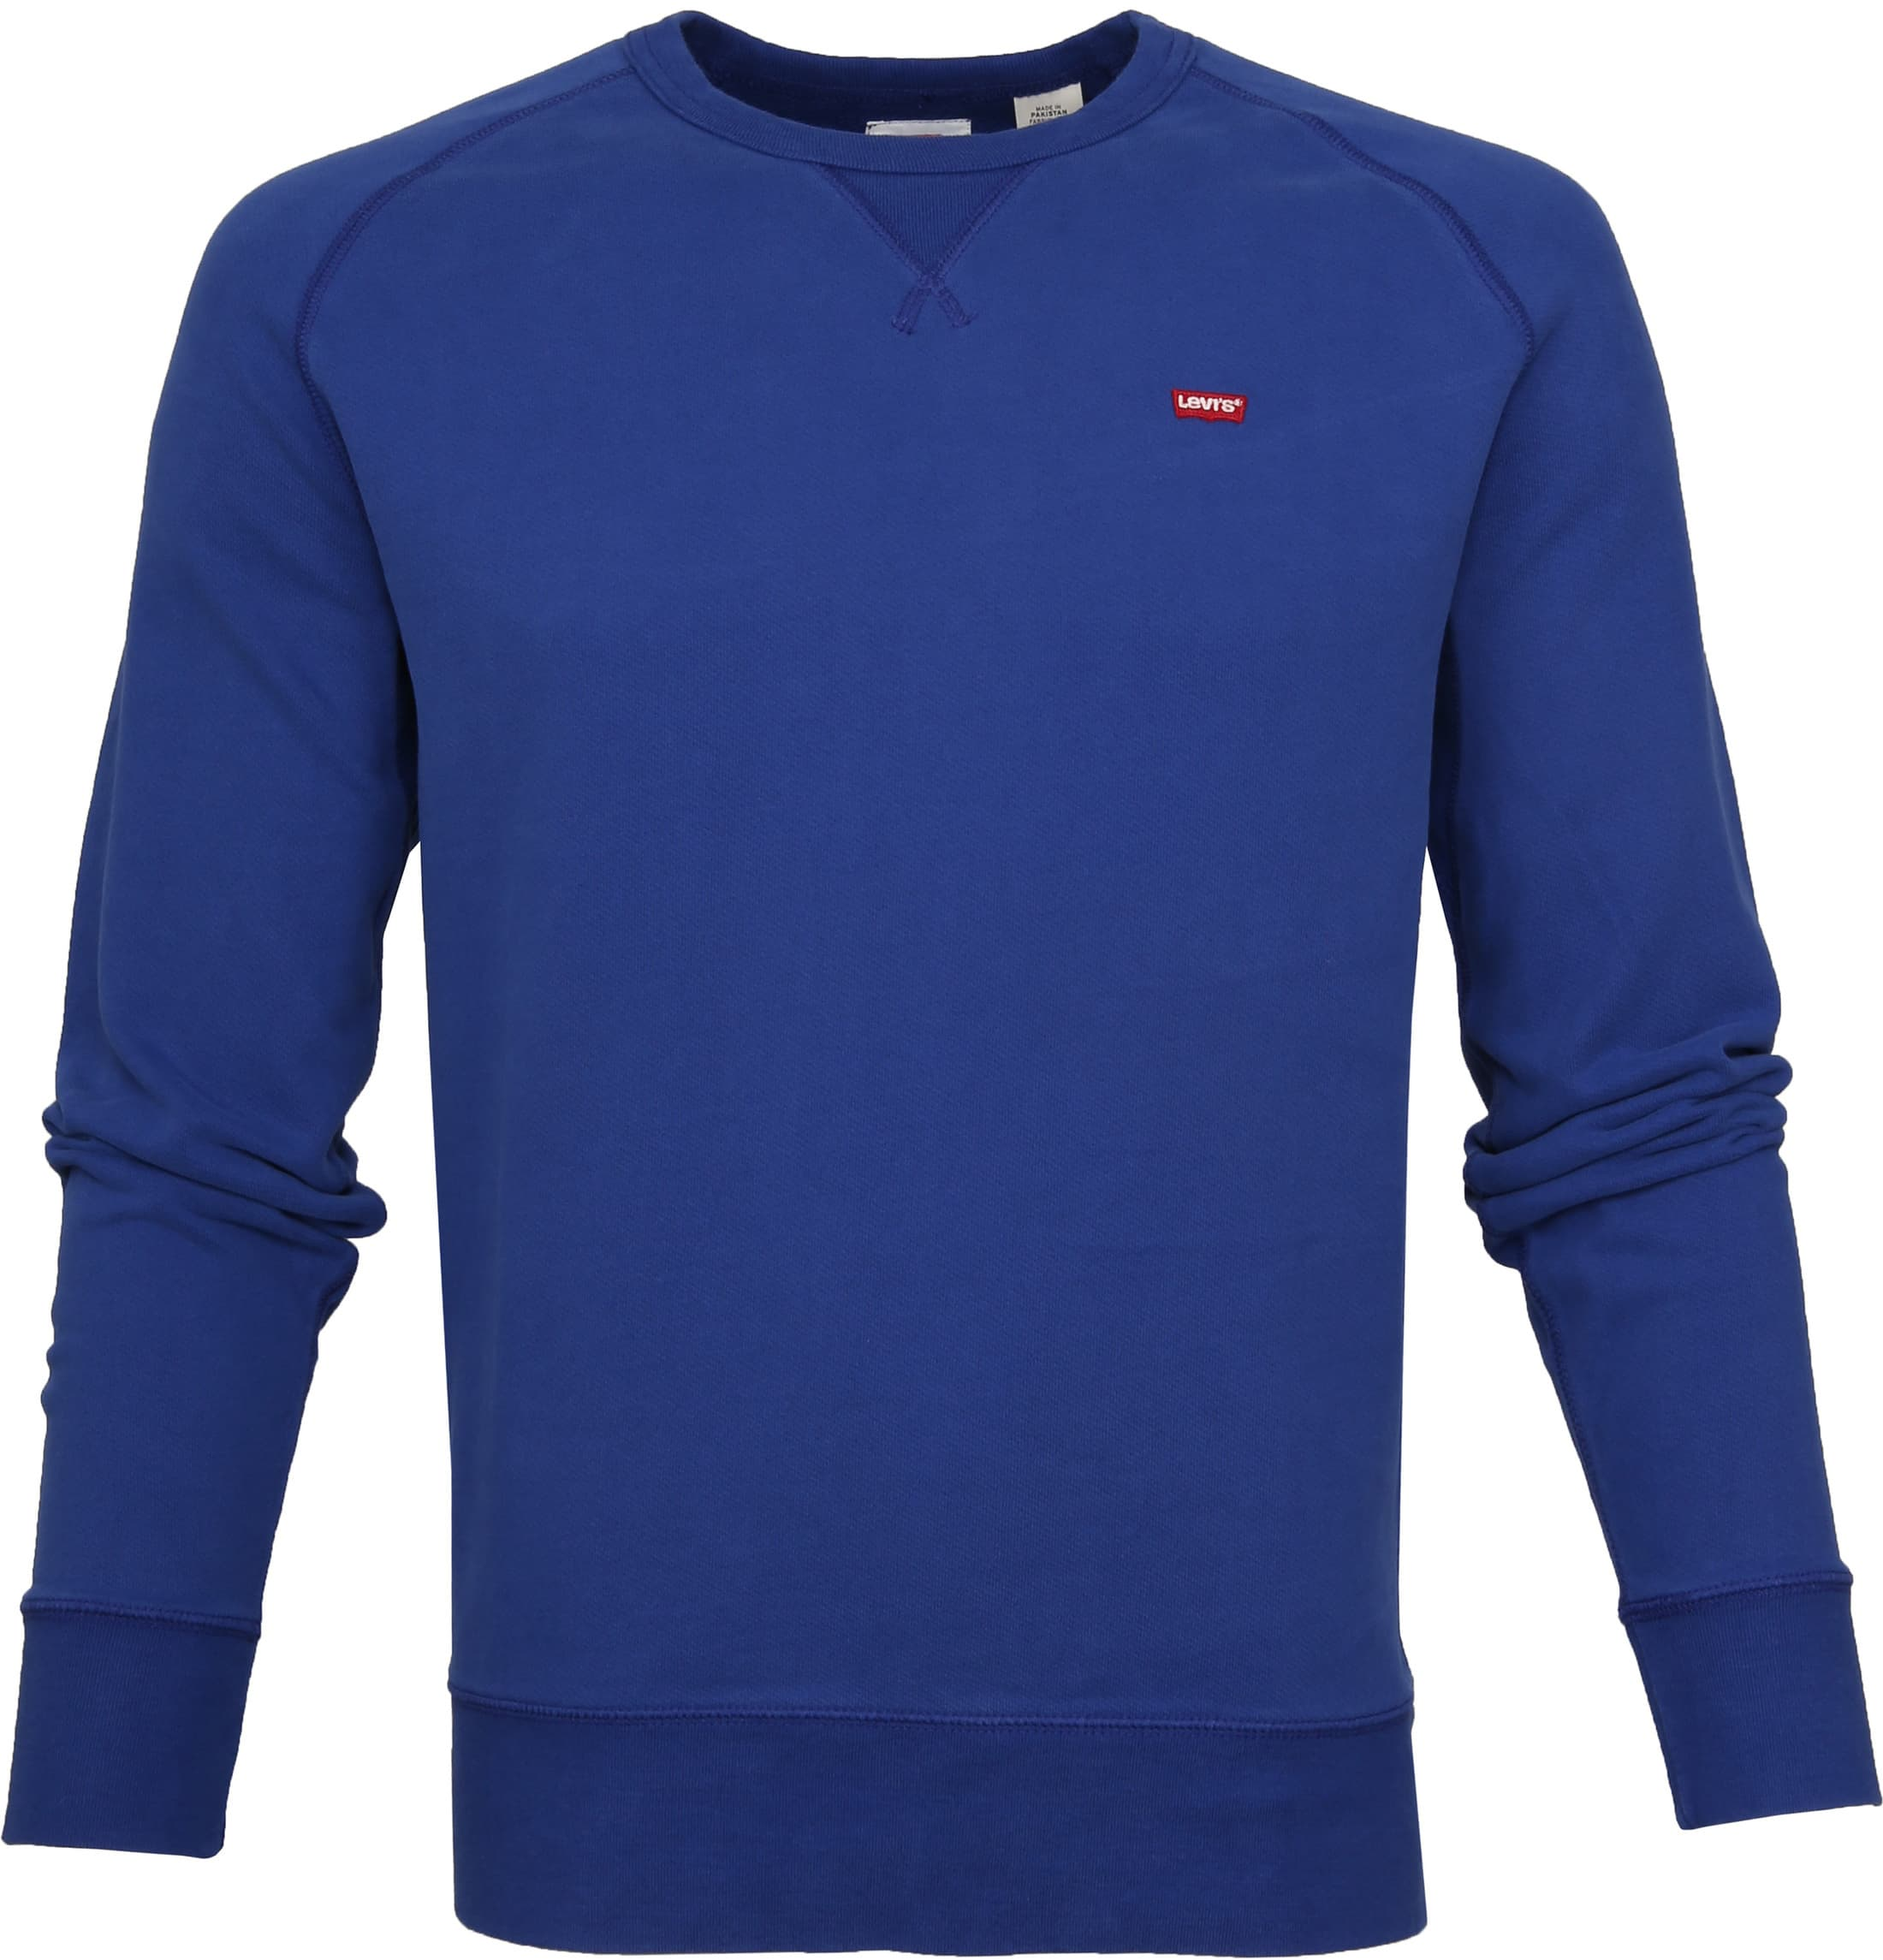 Levi's Original Sweater Indigo Blue photo 0